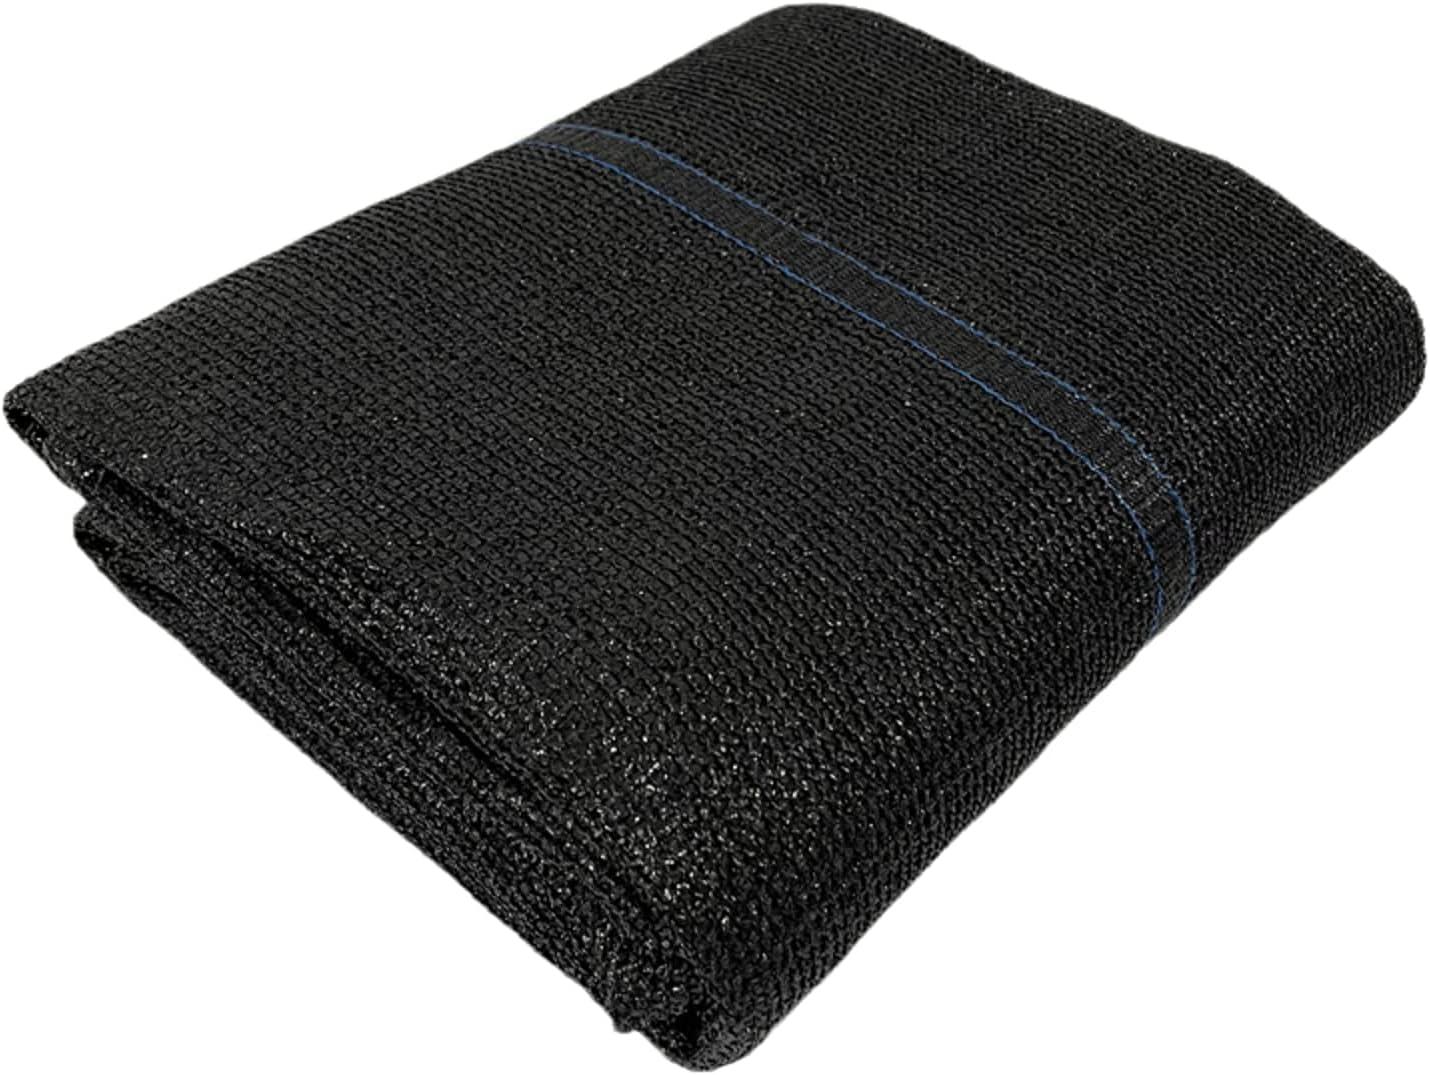 OeltWsoif 28-PIN Encryption Heat Insulation Shade Las Vegas Mall Me New product type Black Cloth